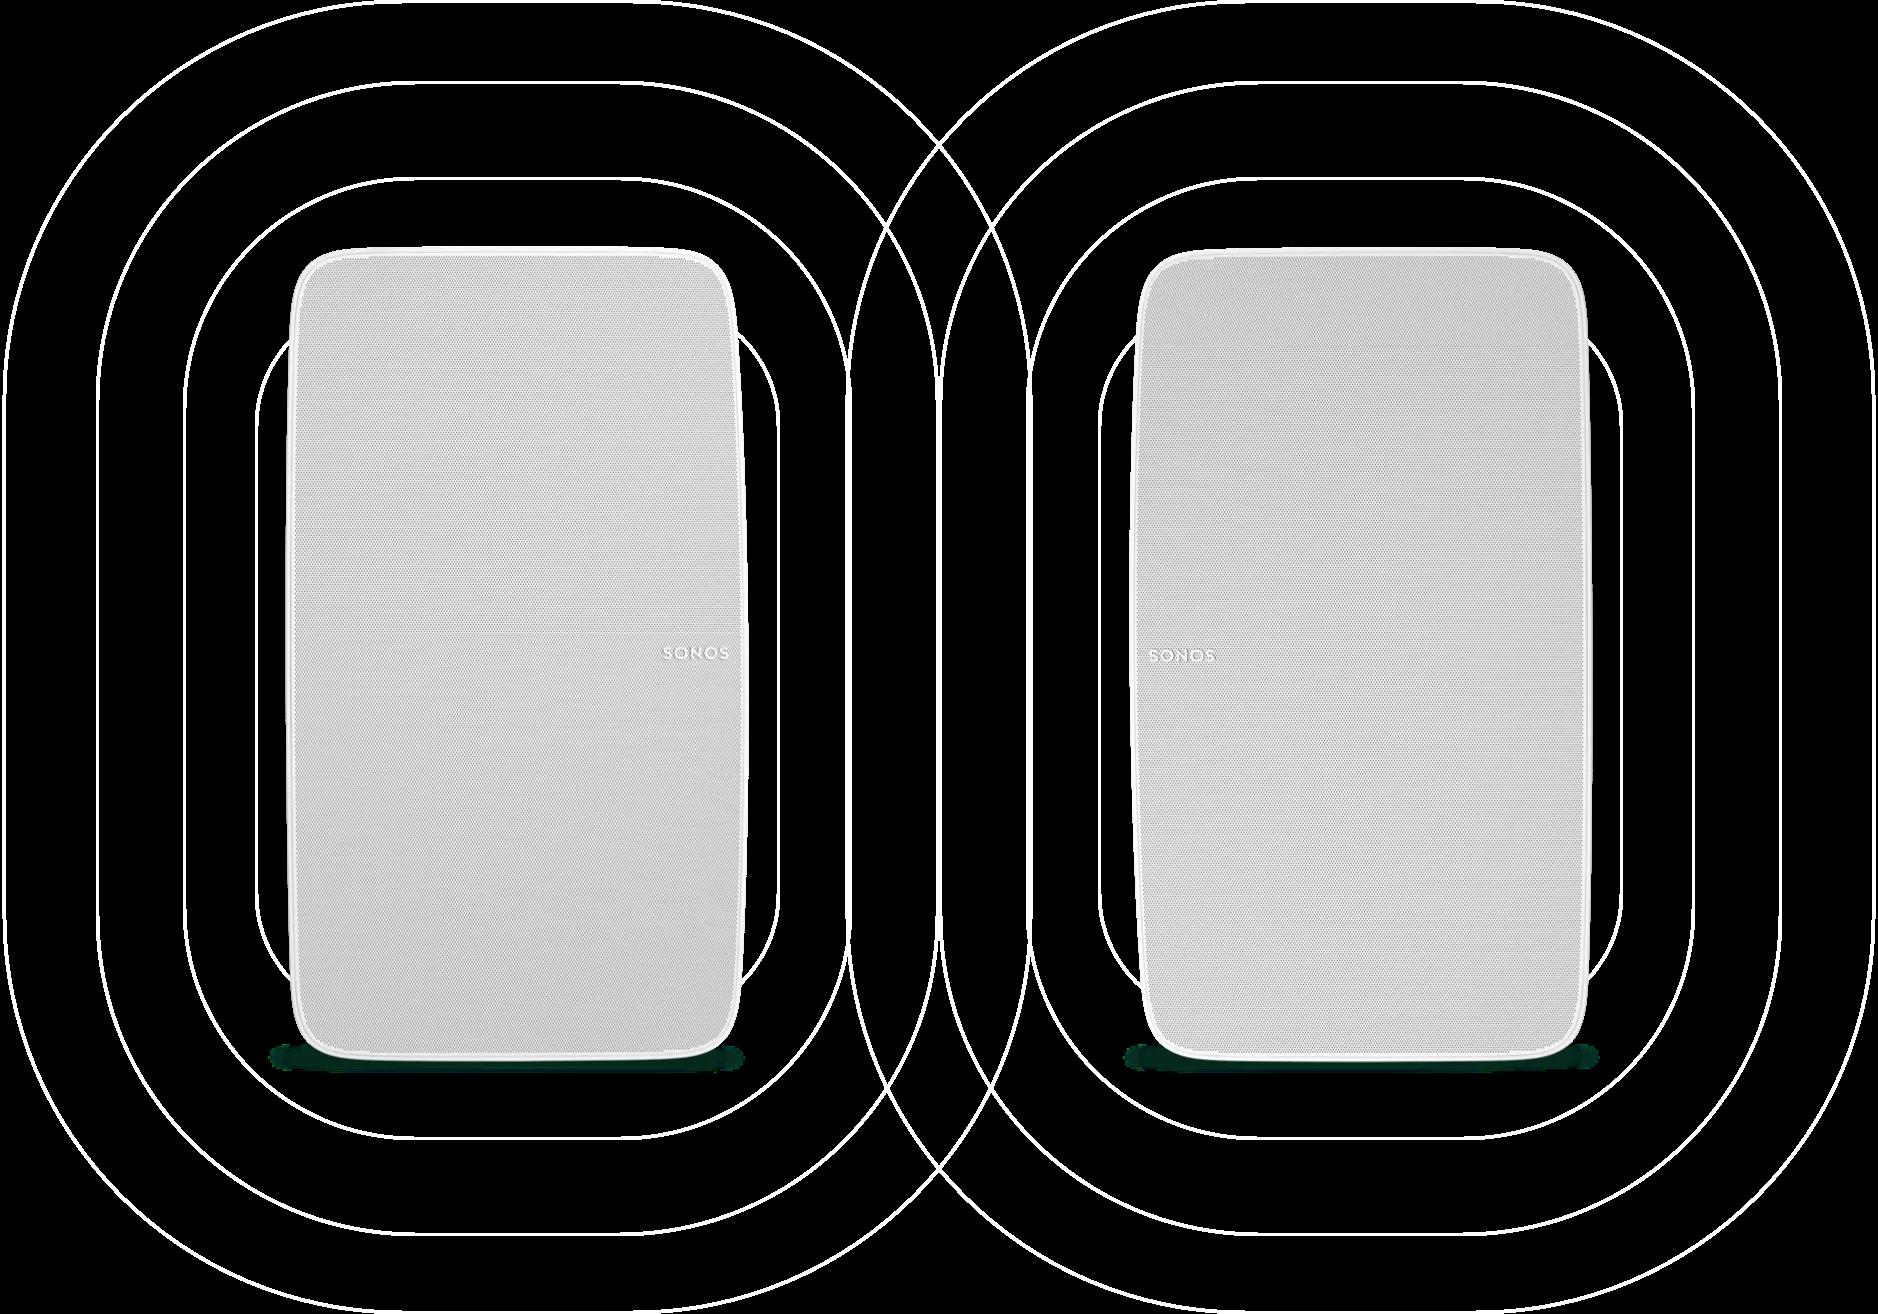 five-pair-vertical-white-soundwaves_2